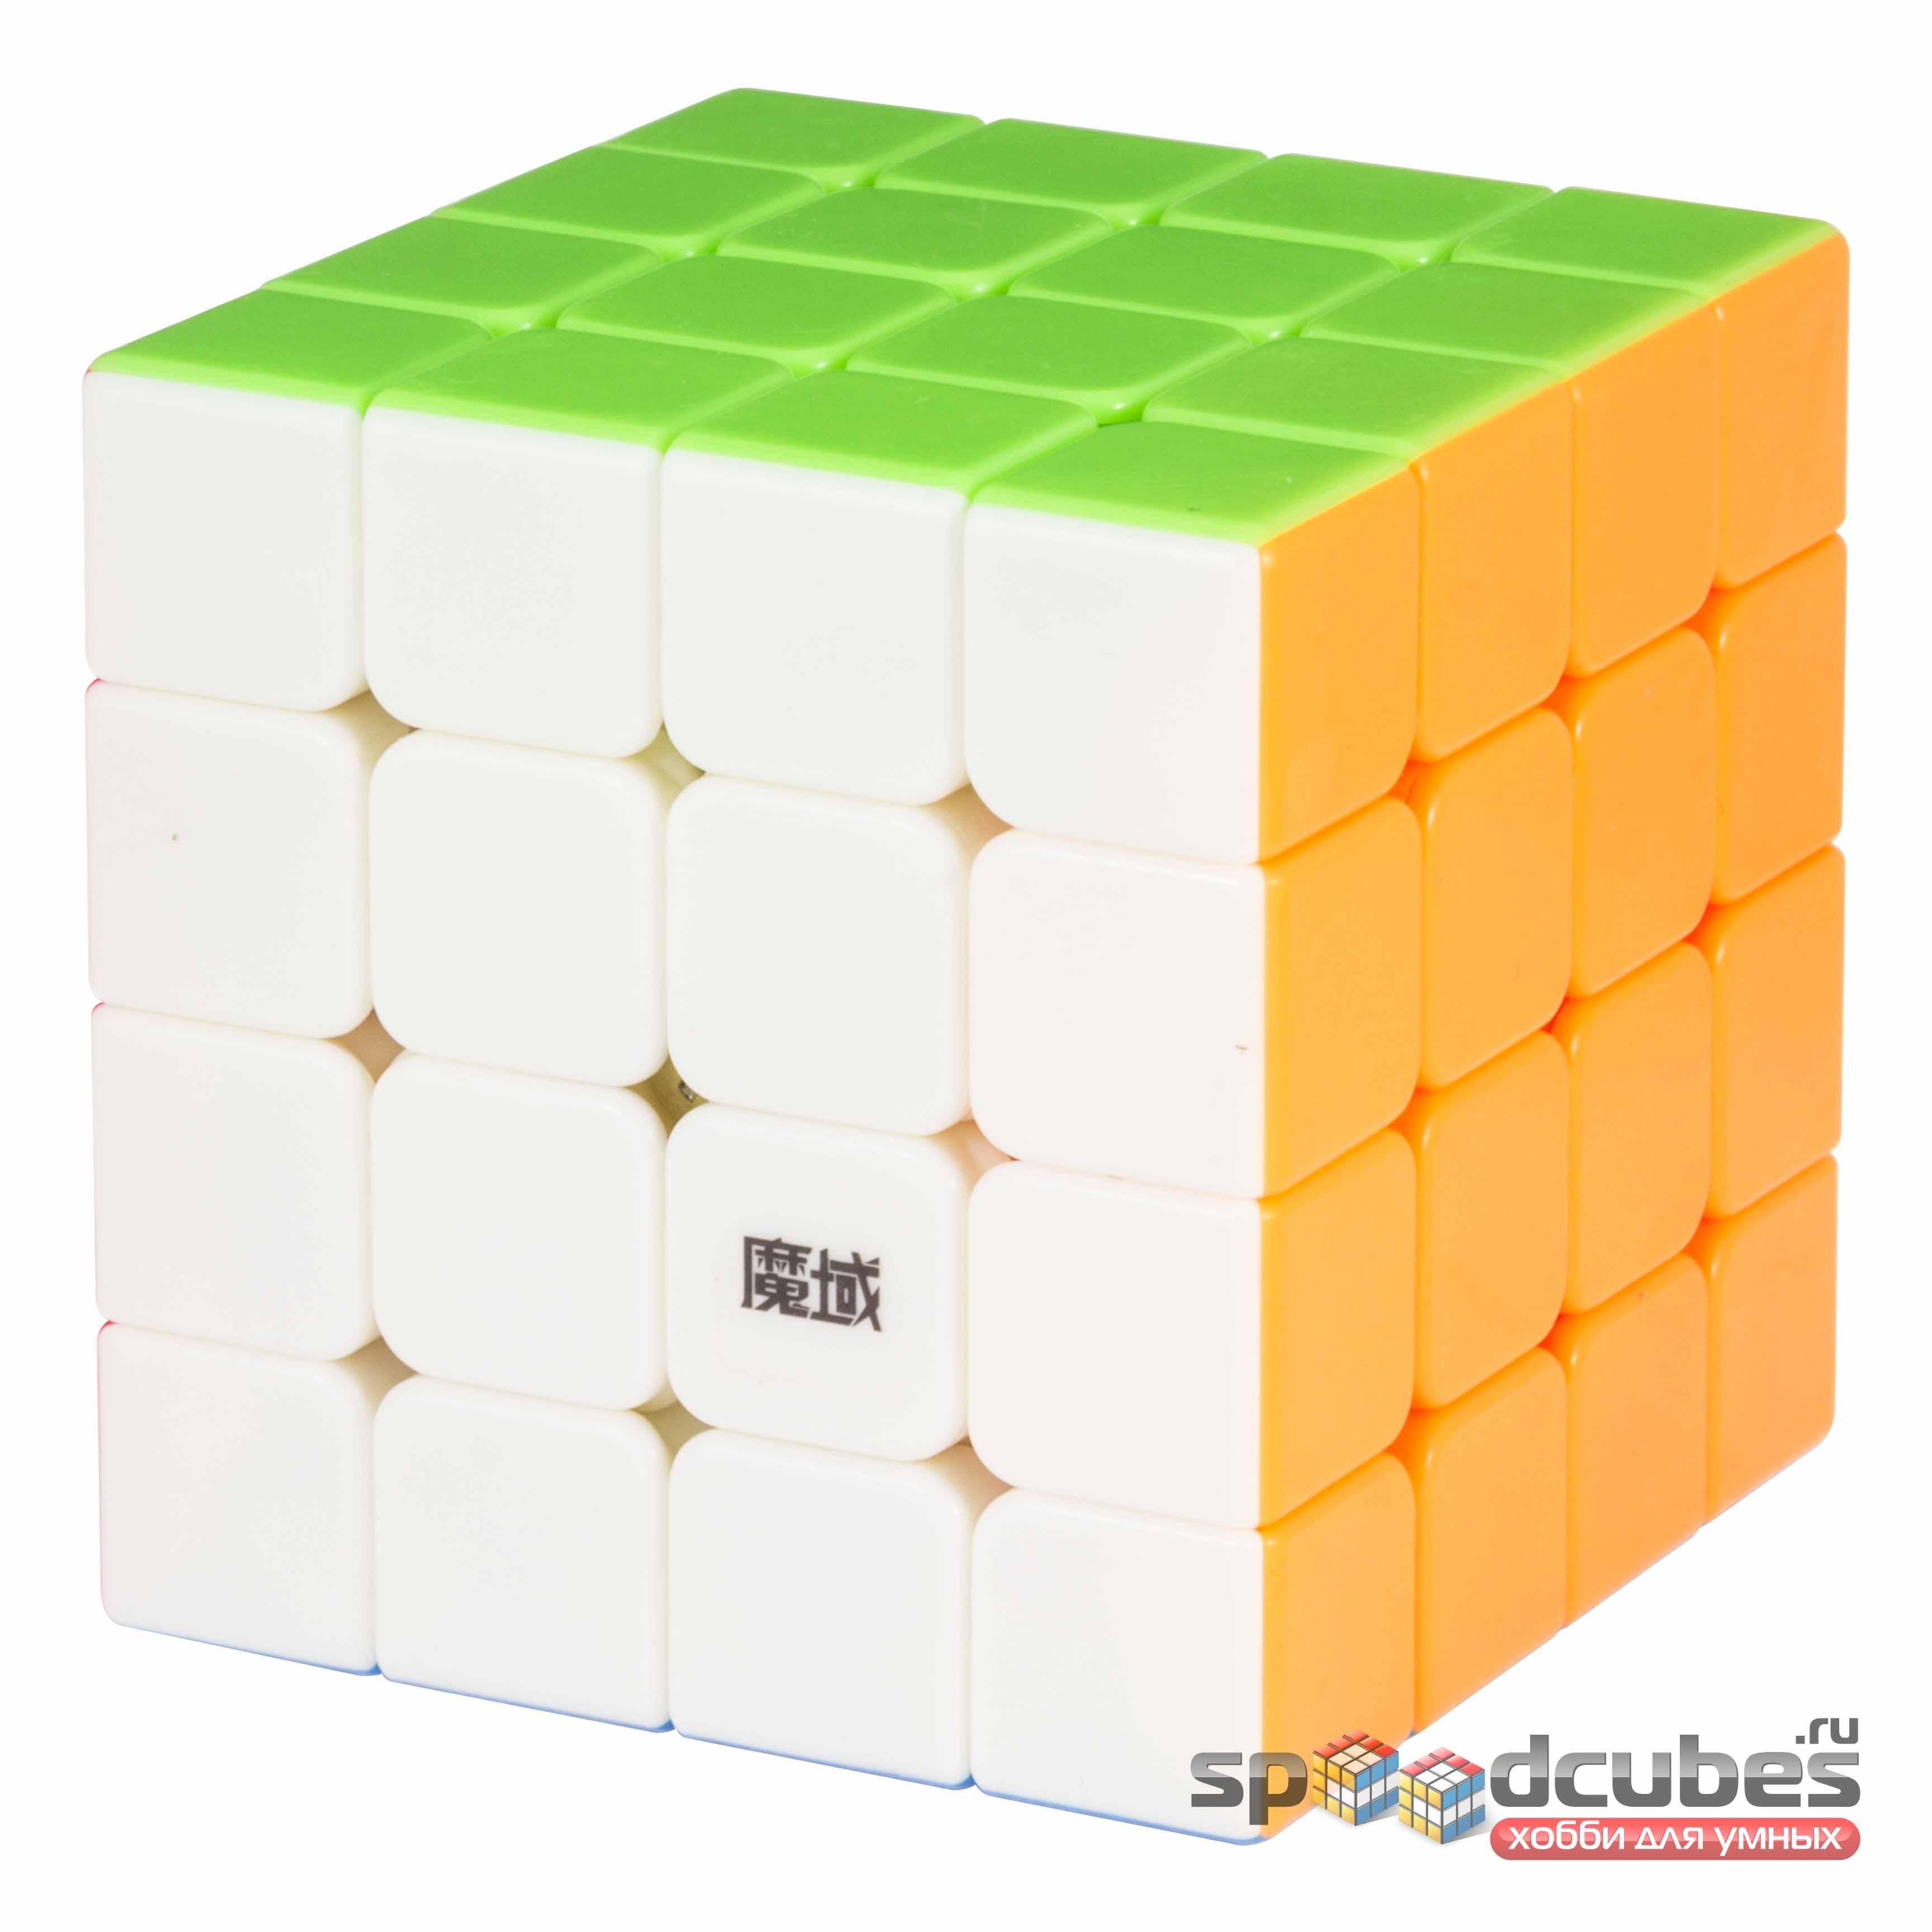 MoYu 4x4x4 Aosu Tsv 2